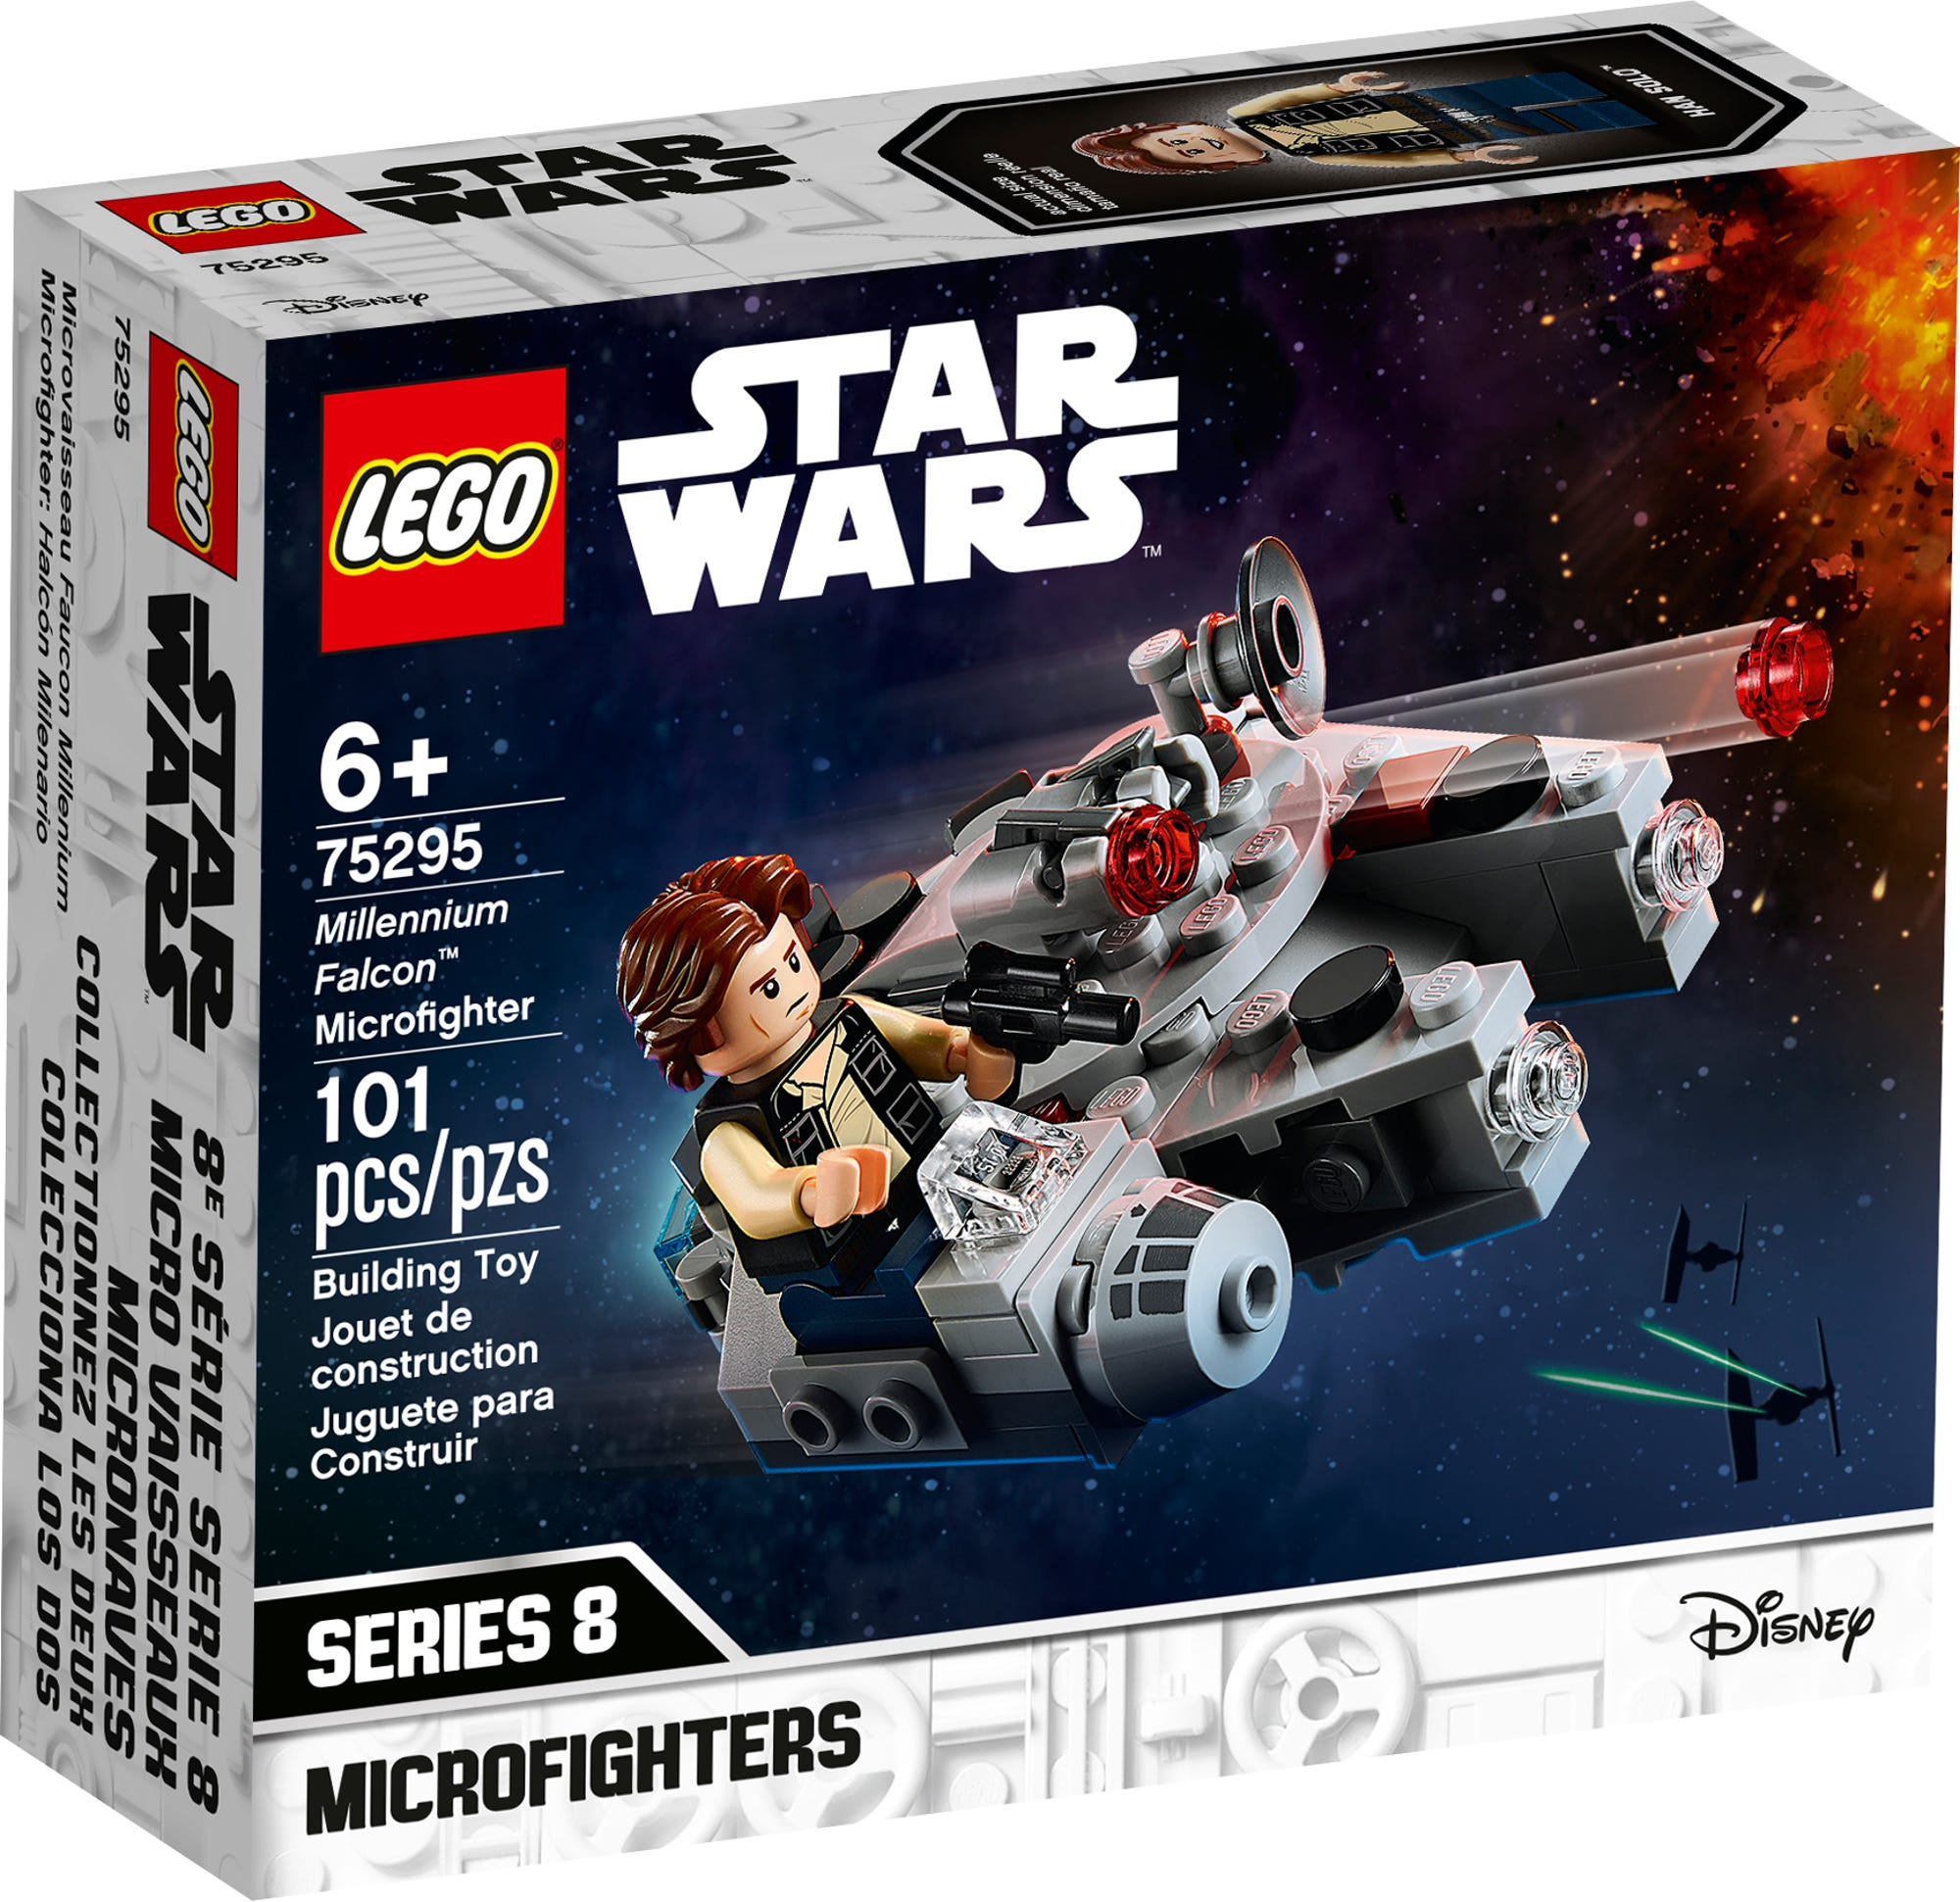 LEGO Star Wars 75295 Millennium Falcon Microfighter 4